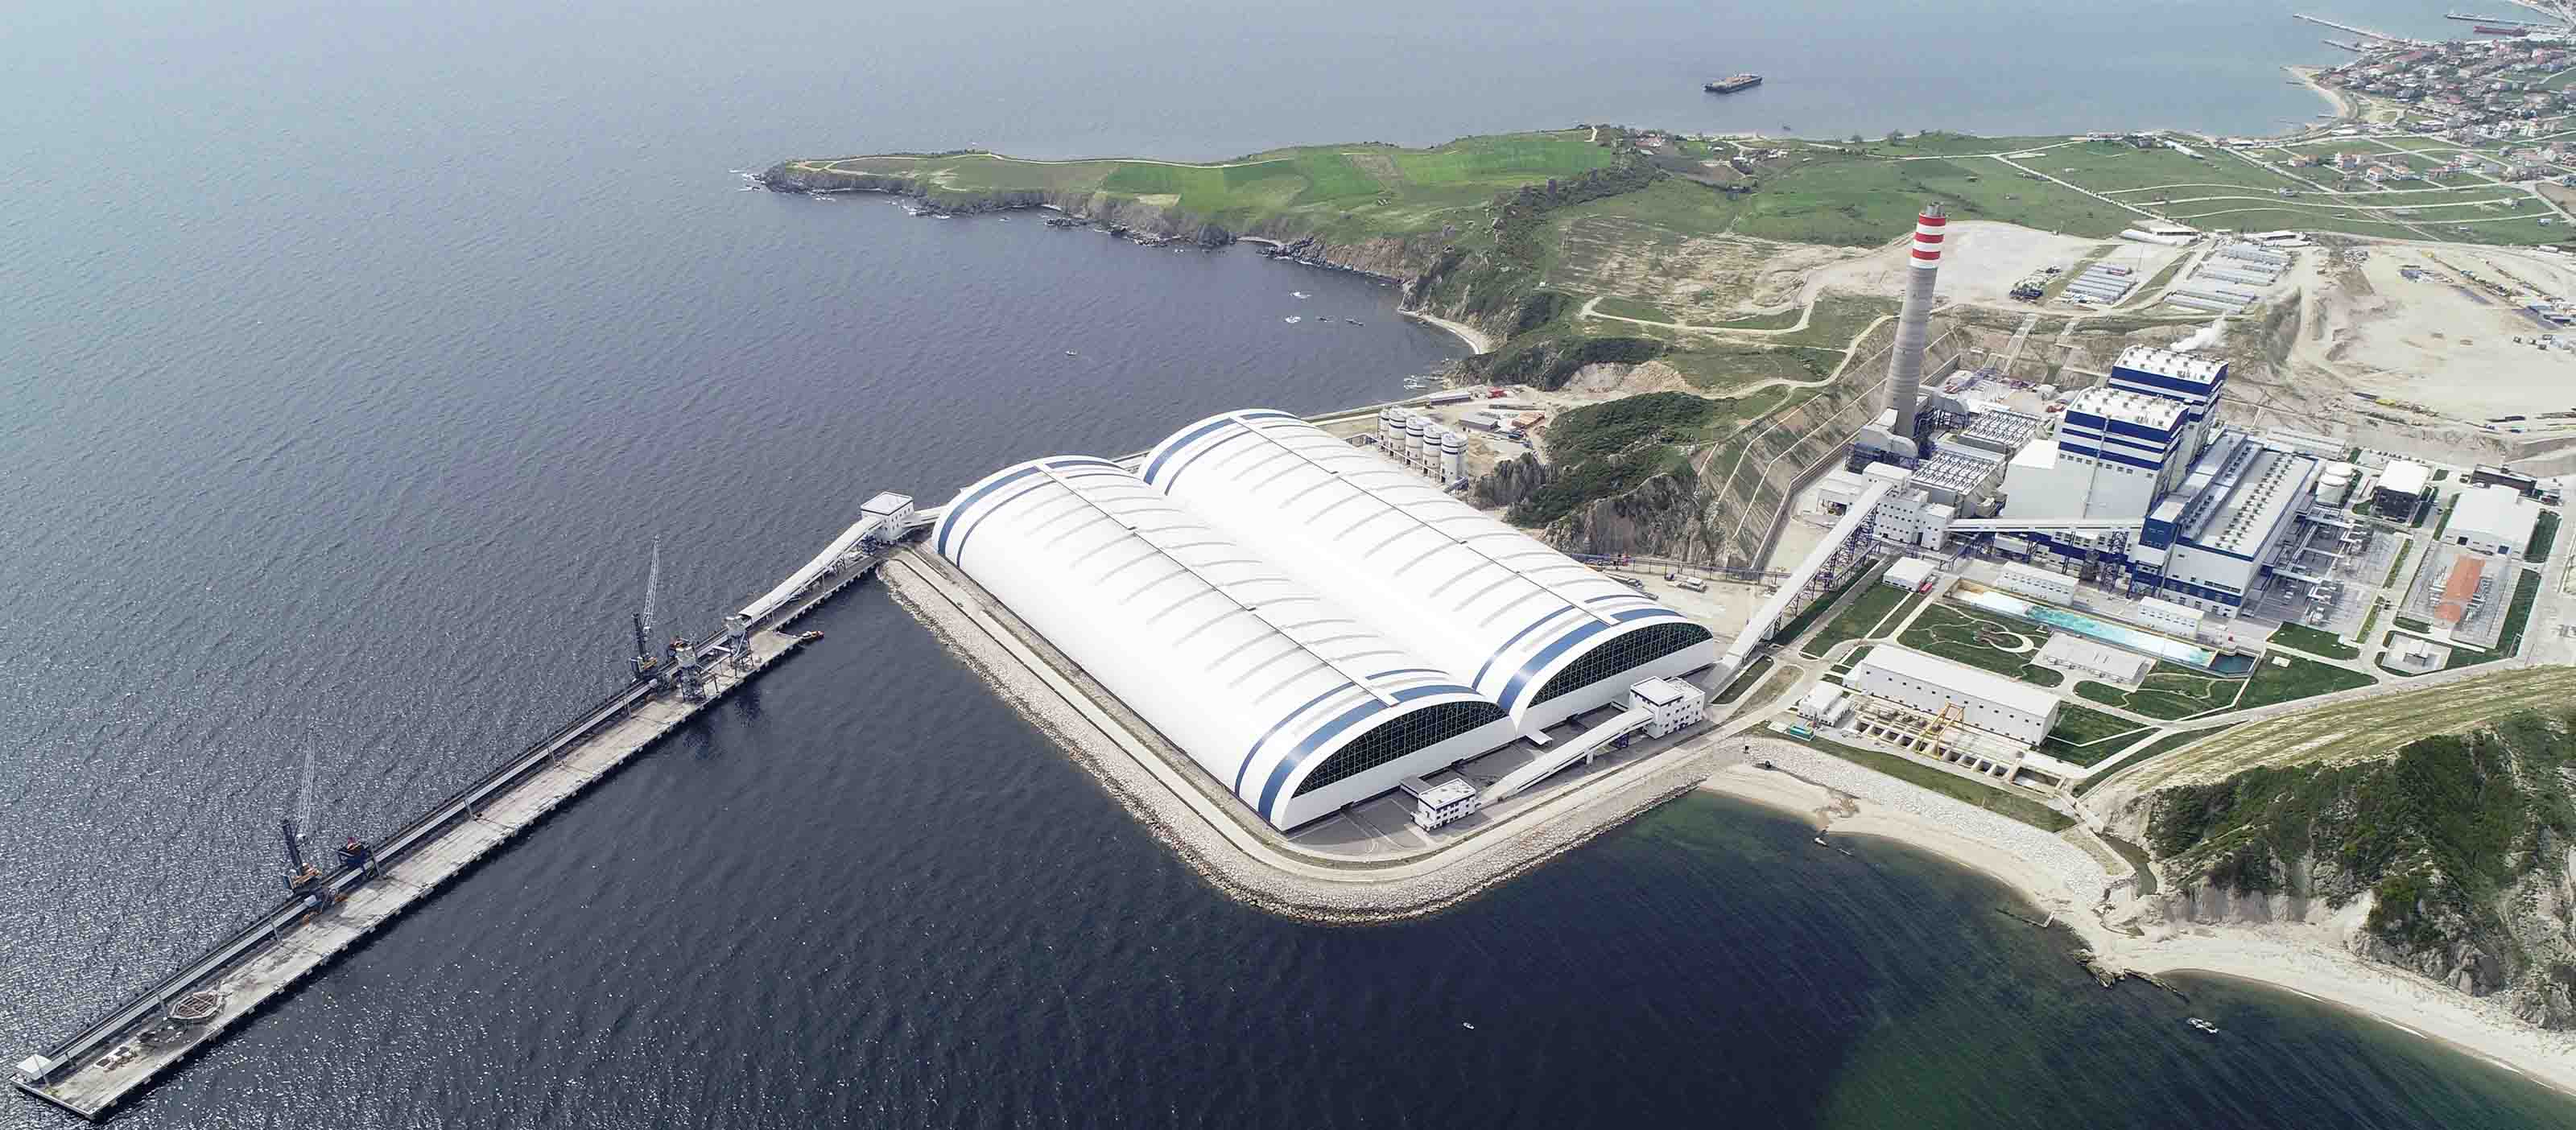 CENAL's Karabiga Steam Power Plant, Turkey | GE Digital Customer story